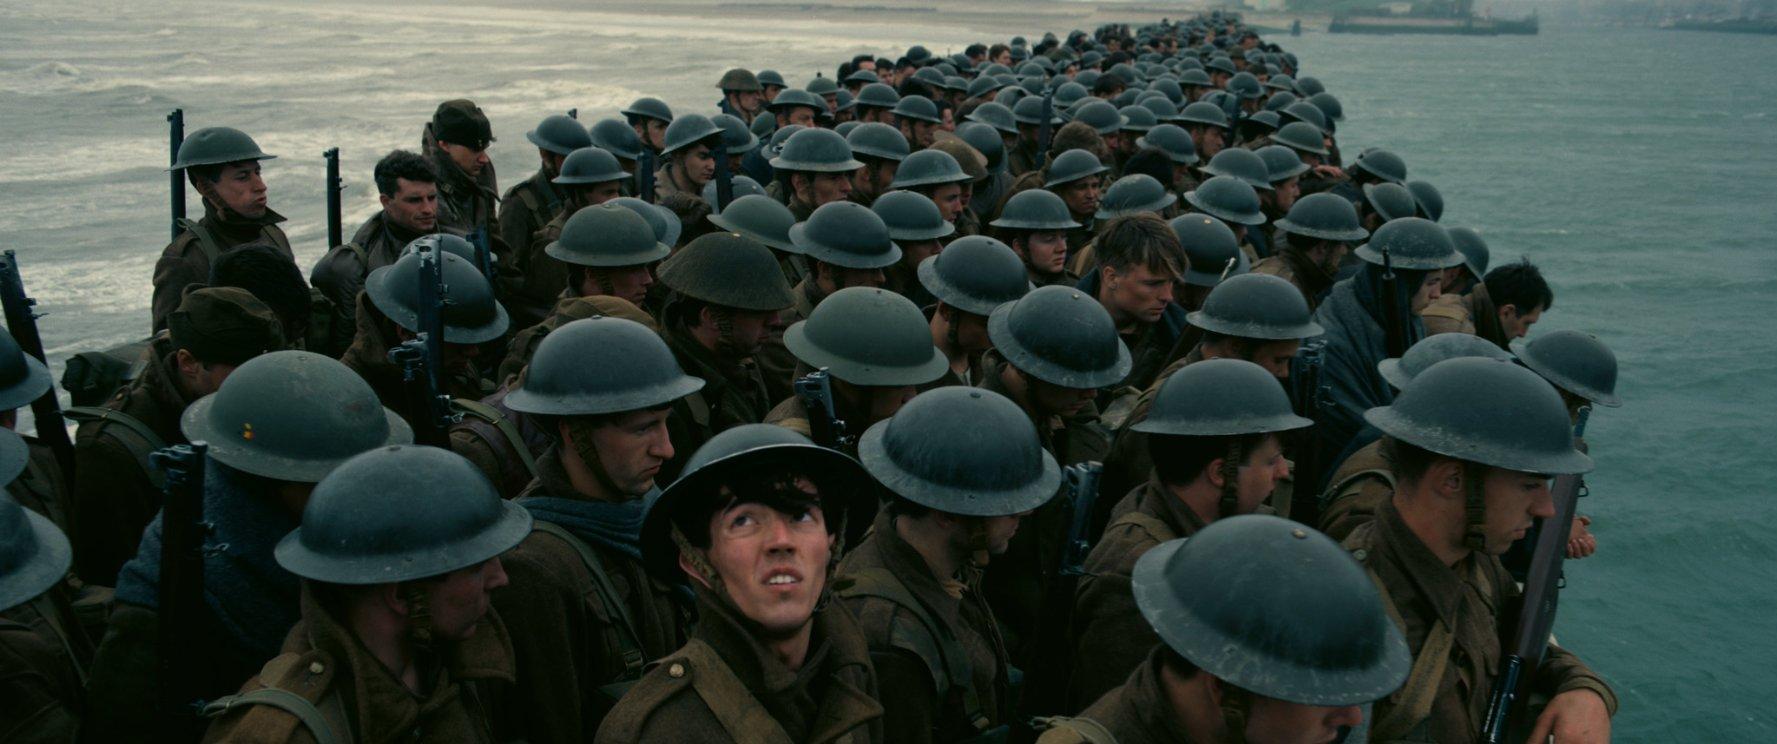 Dunkirk - the mole